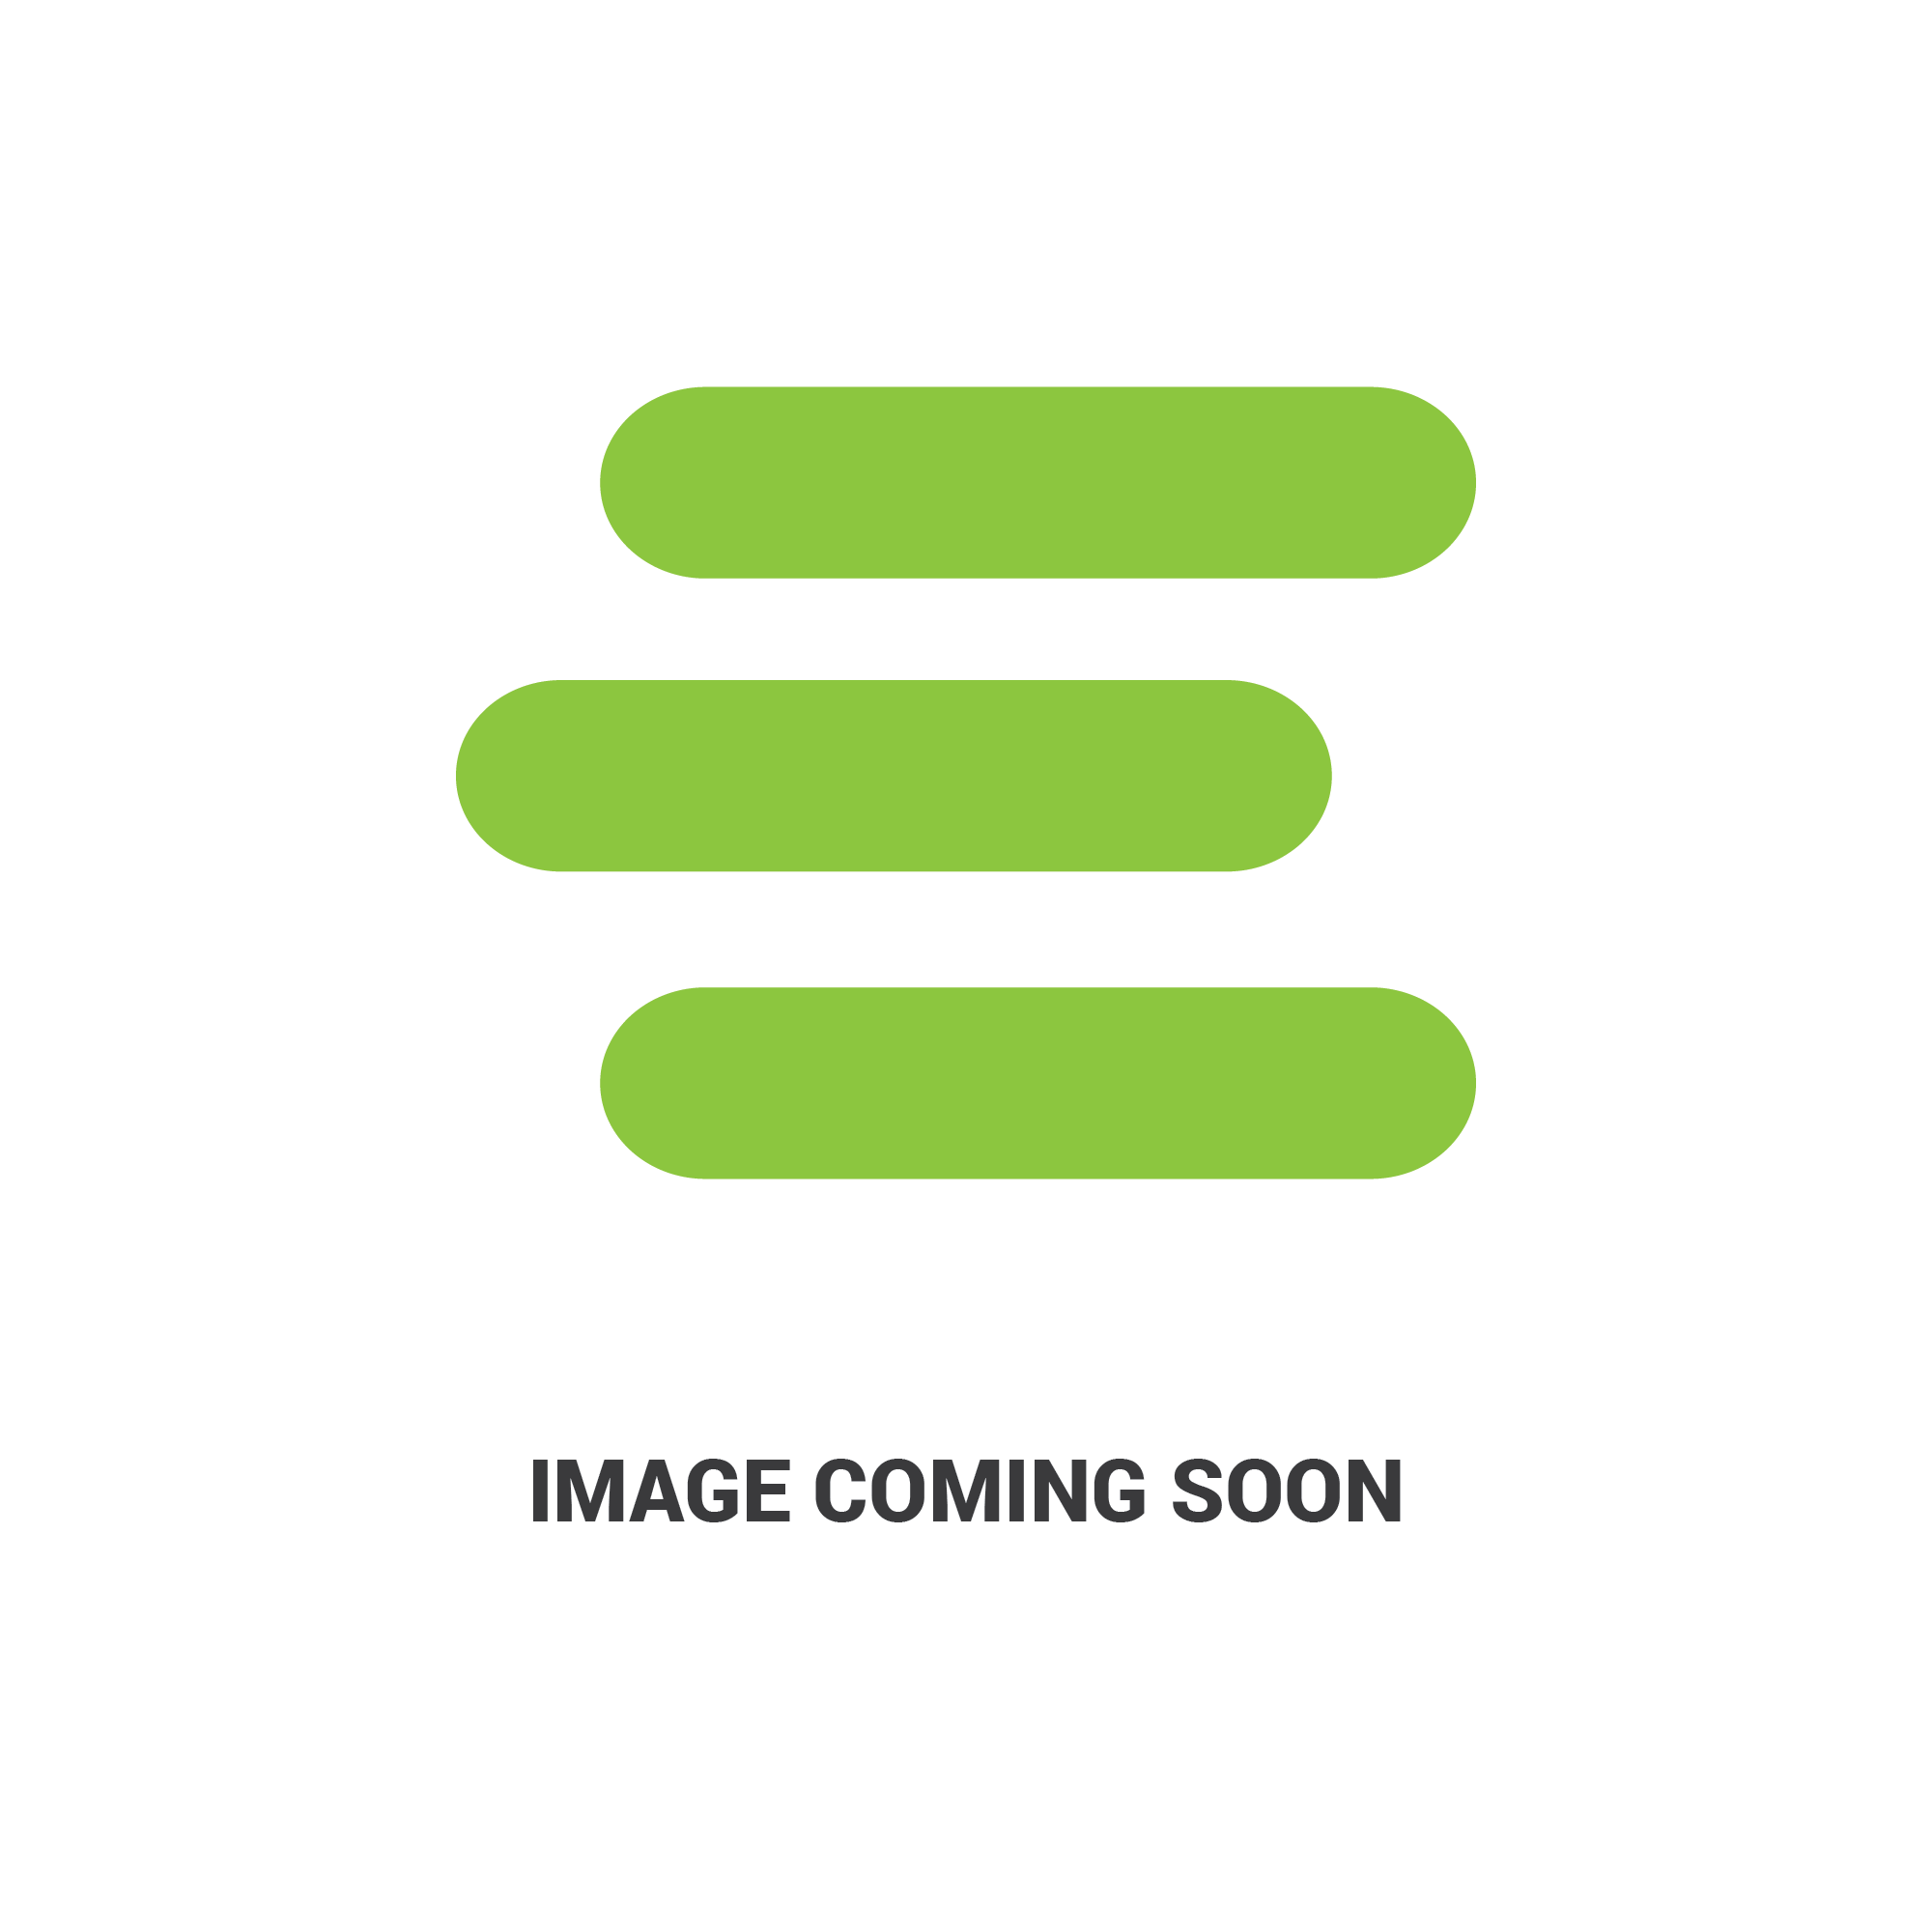 E-204656944_1.jpg